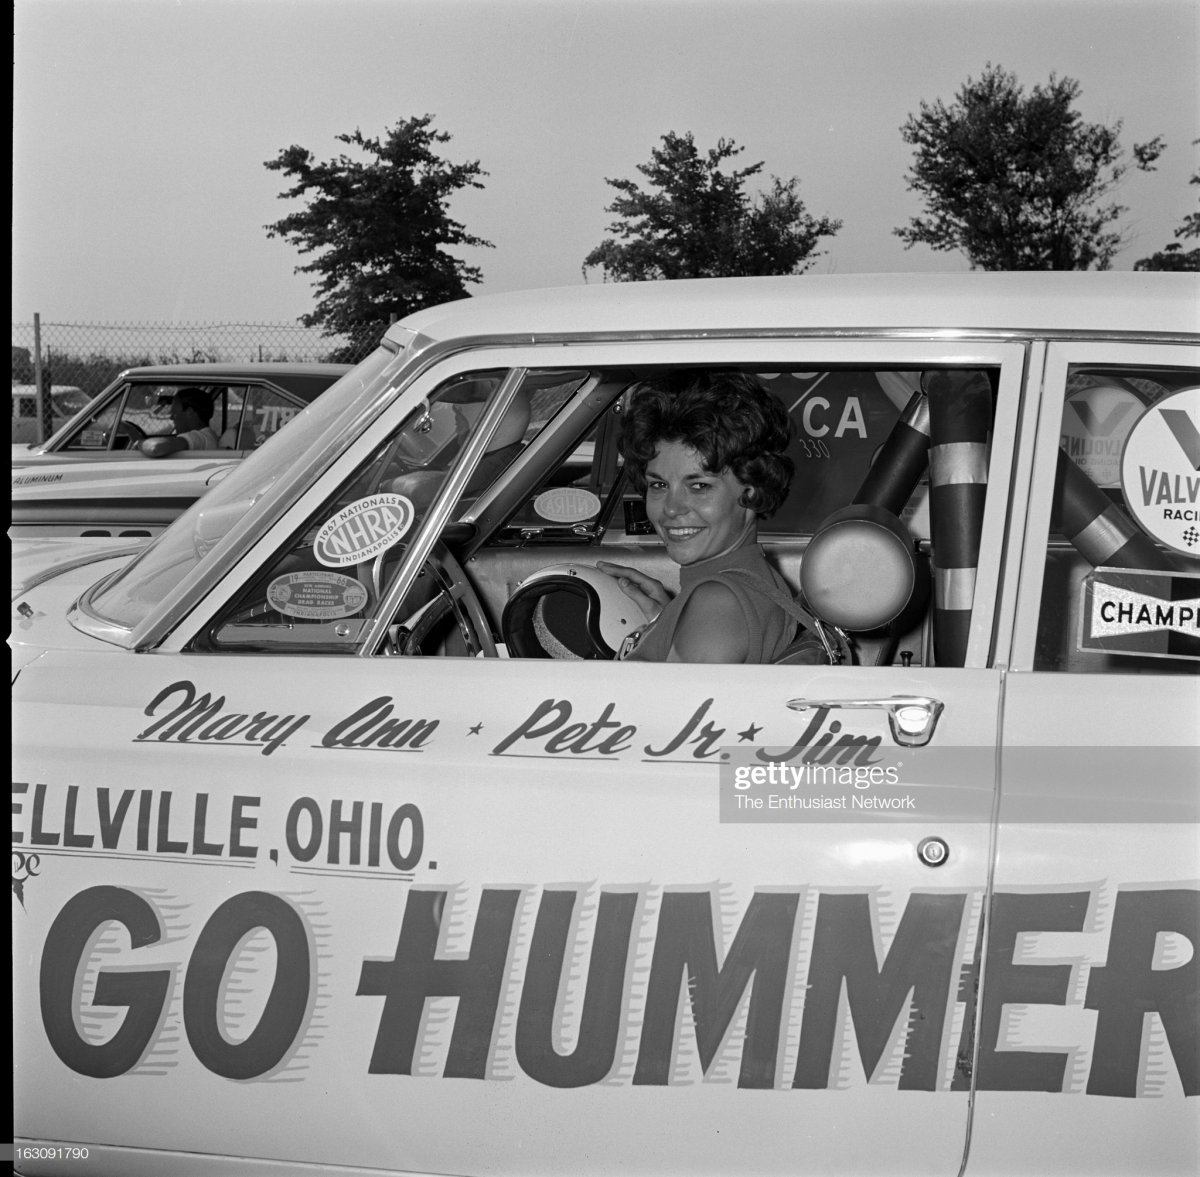 Mary Ann Foss in the GO HUMMER Dodge..jpg